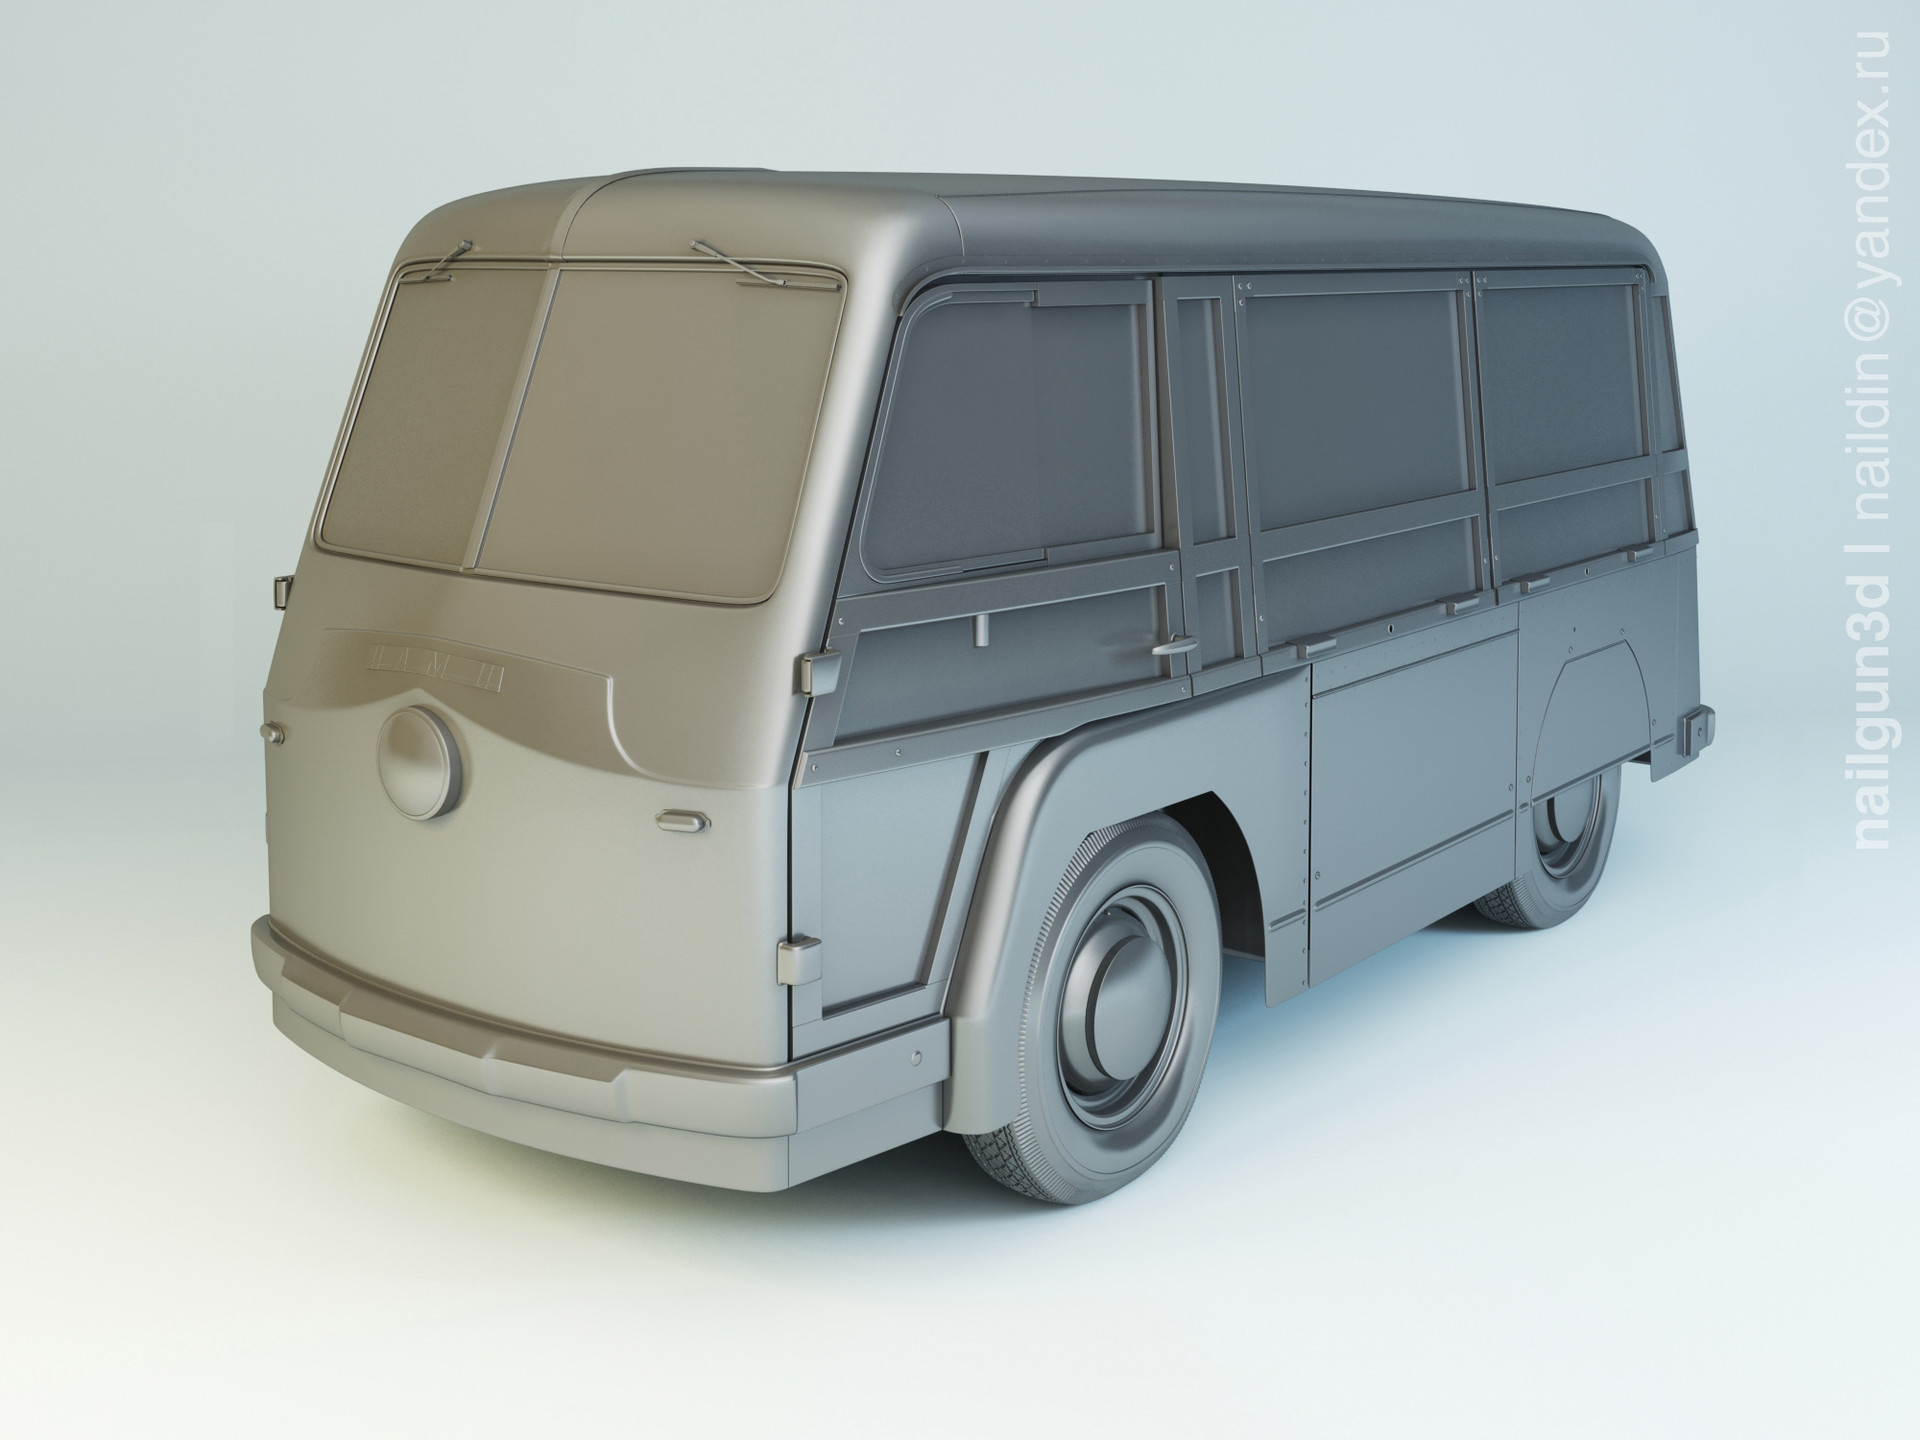 Nail khusnutdinov als 225 003 nami 750 modelling 0